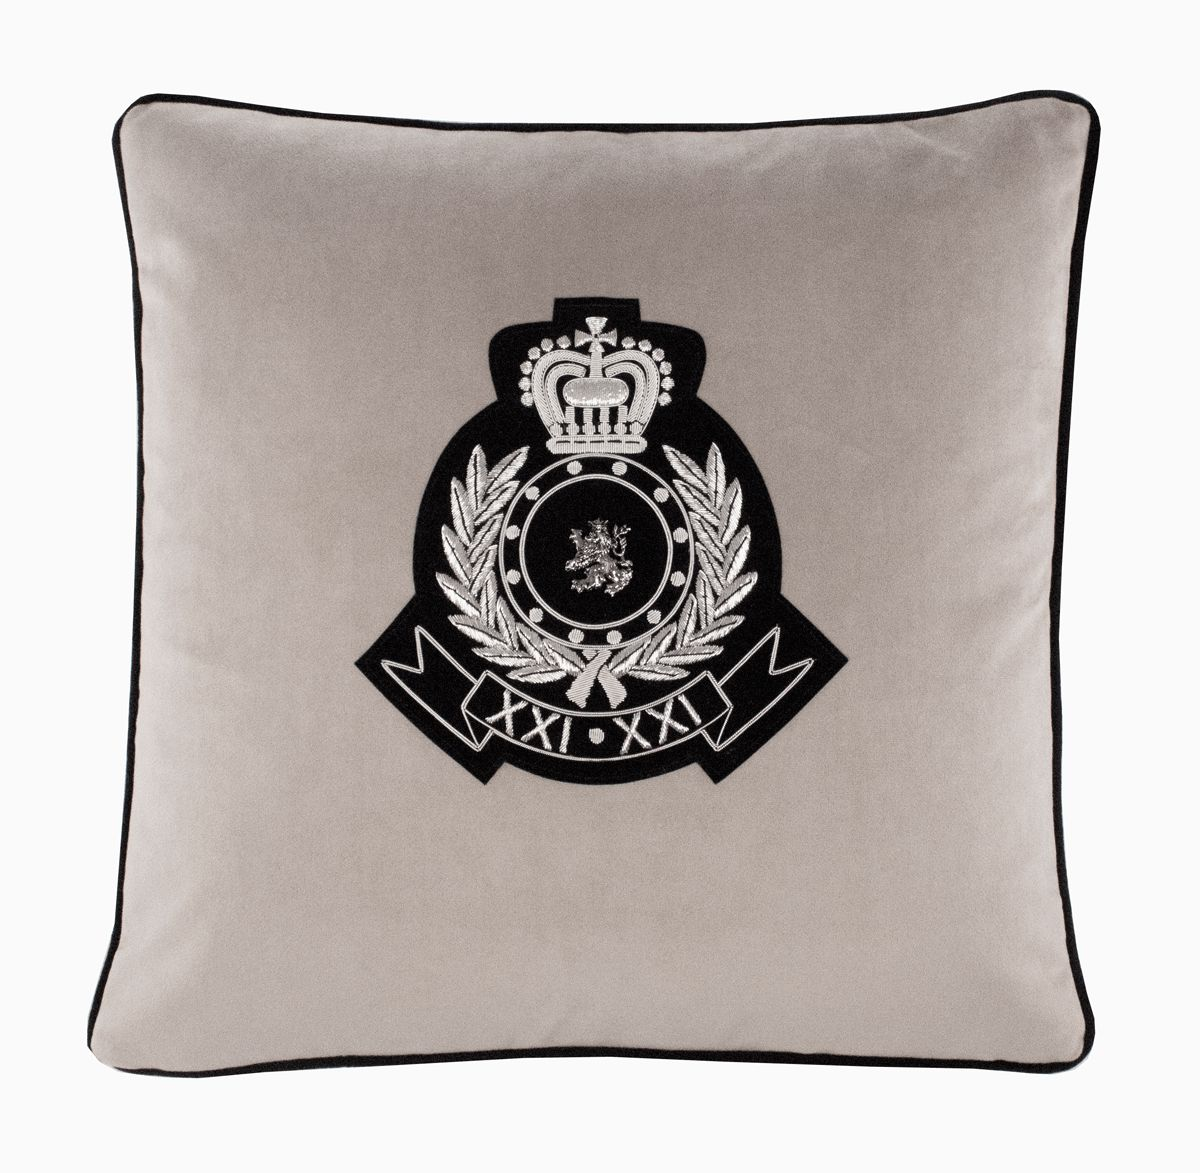 Medusa II cushion with heraldic crest.